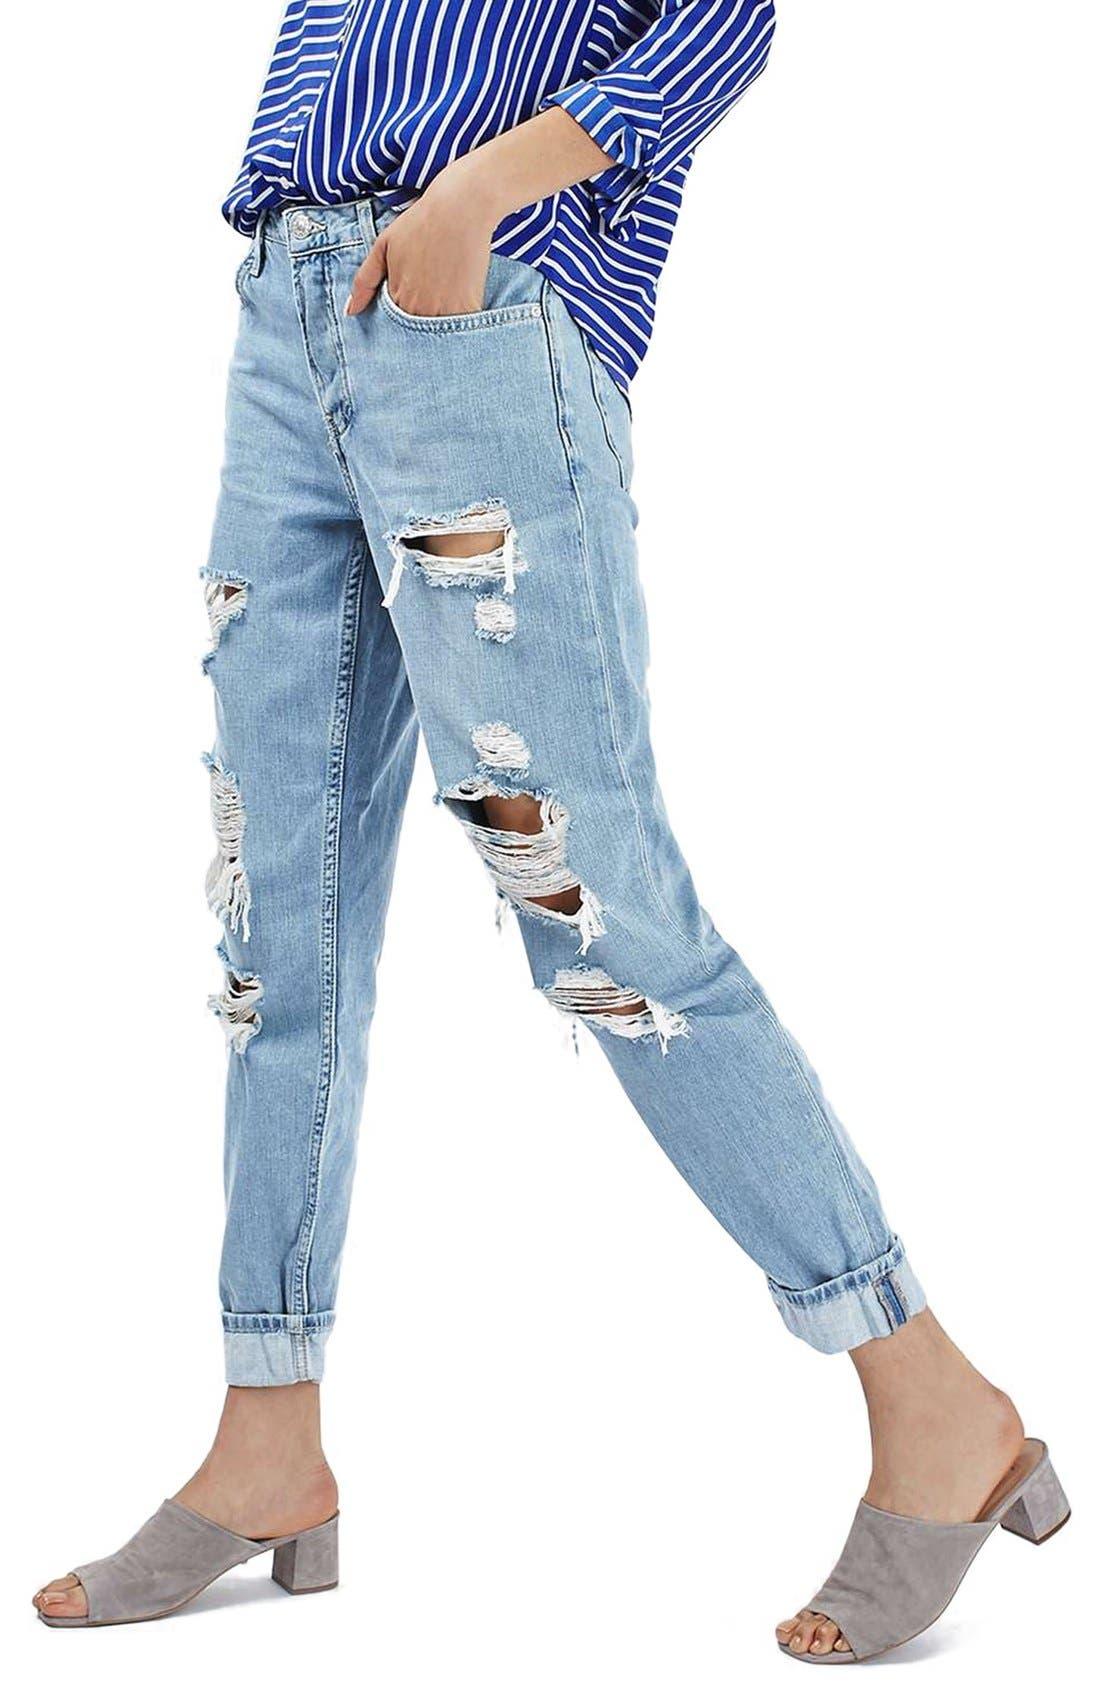 TOPSHOP 'Hayden' Super Ripped Boyfriend Jeans, Main, color, 420